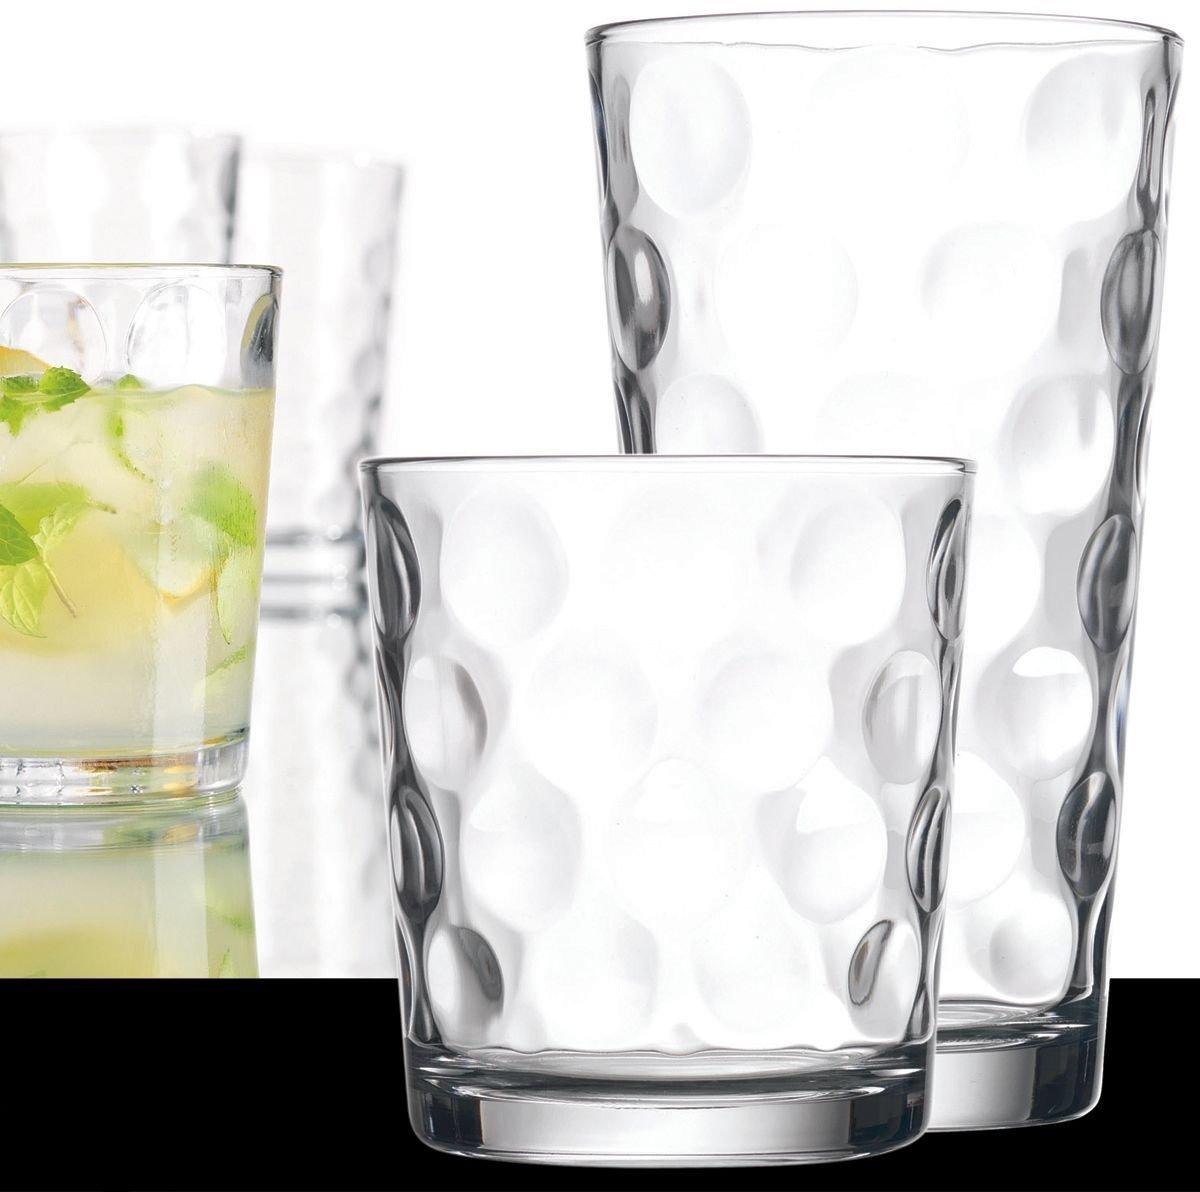 Set of 16 Heavy Base Bubble Design Drinking Glasses Includes 8 Cooler Glasses(17oz) and 8 Rocks Glasses(13oz), 16-piece Stylish Glassware Set